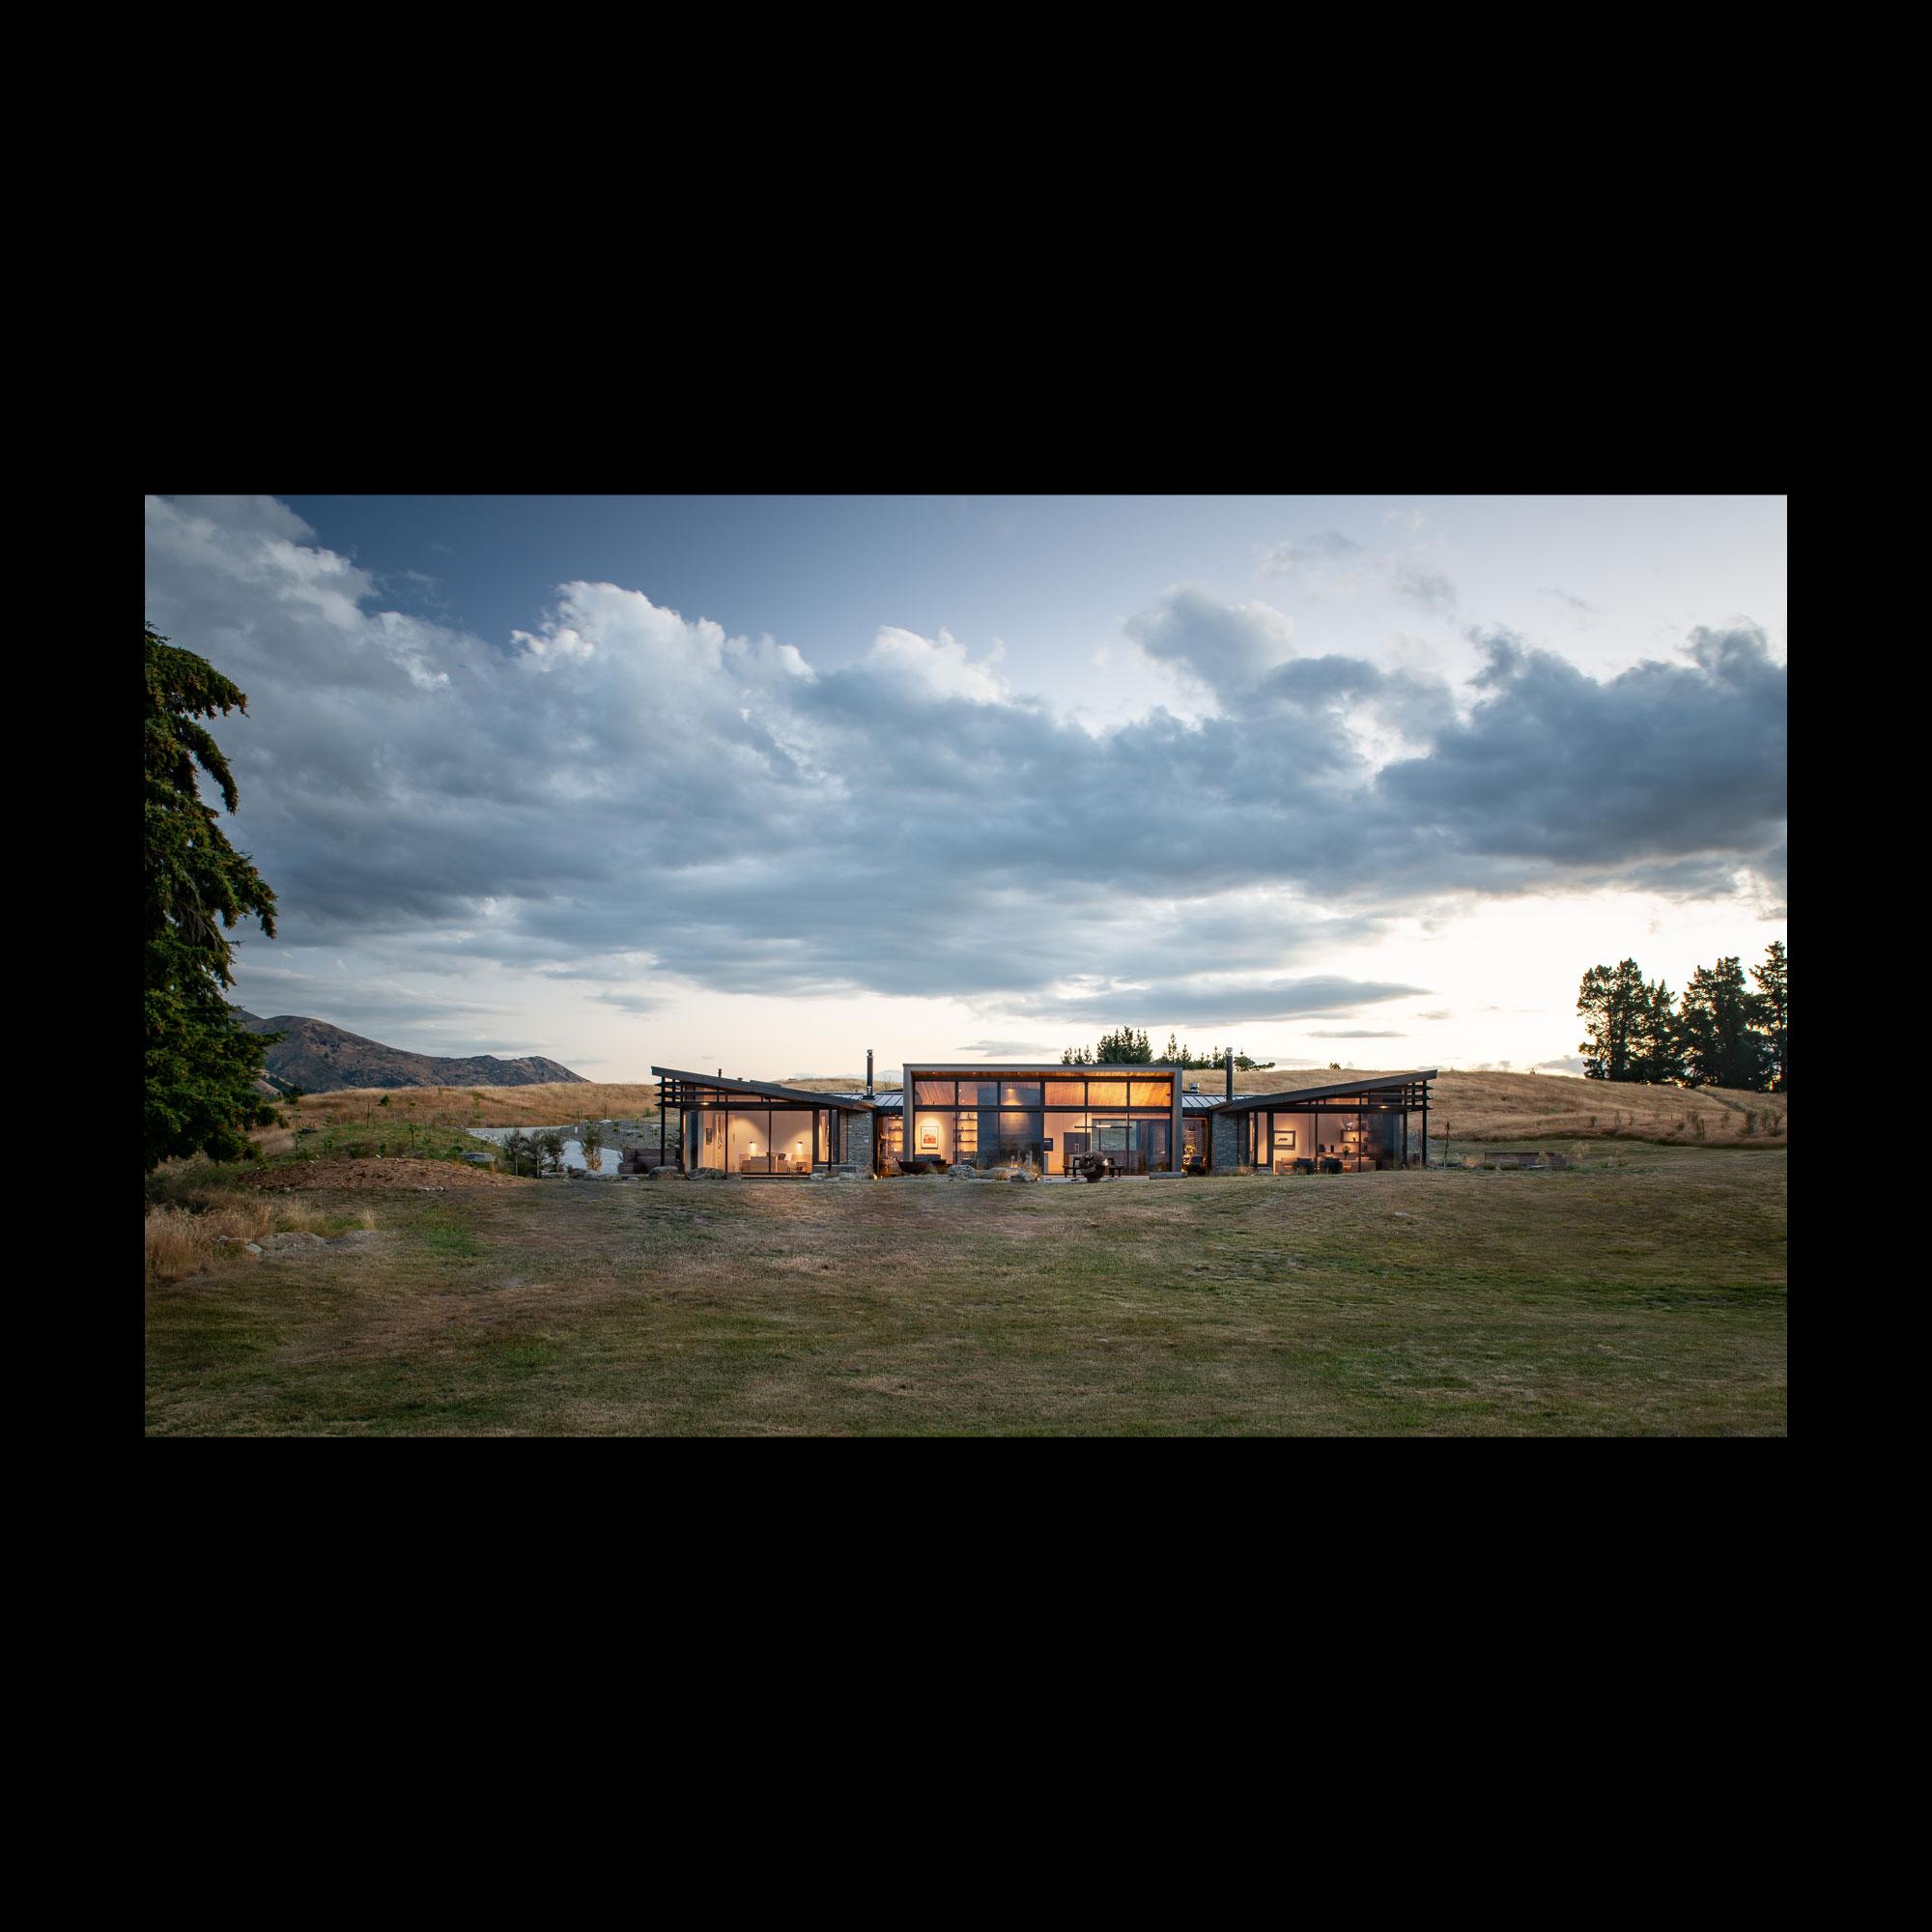 LD-photo-architecture-hw1.jpg